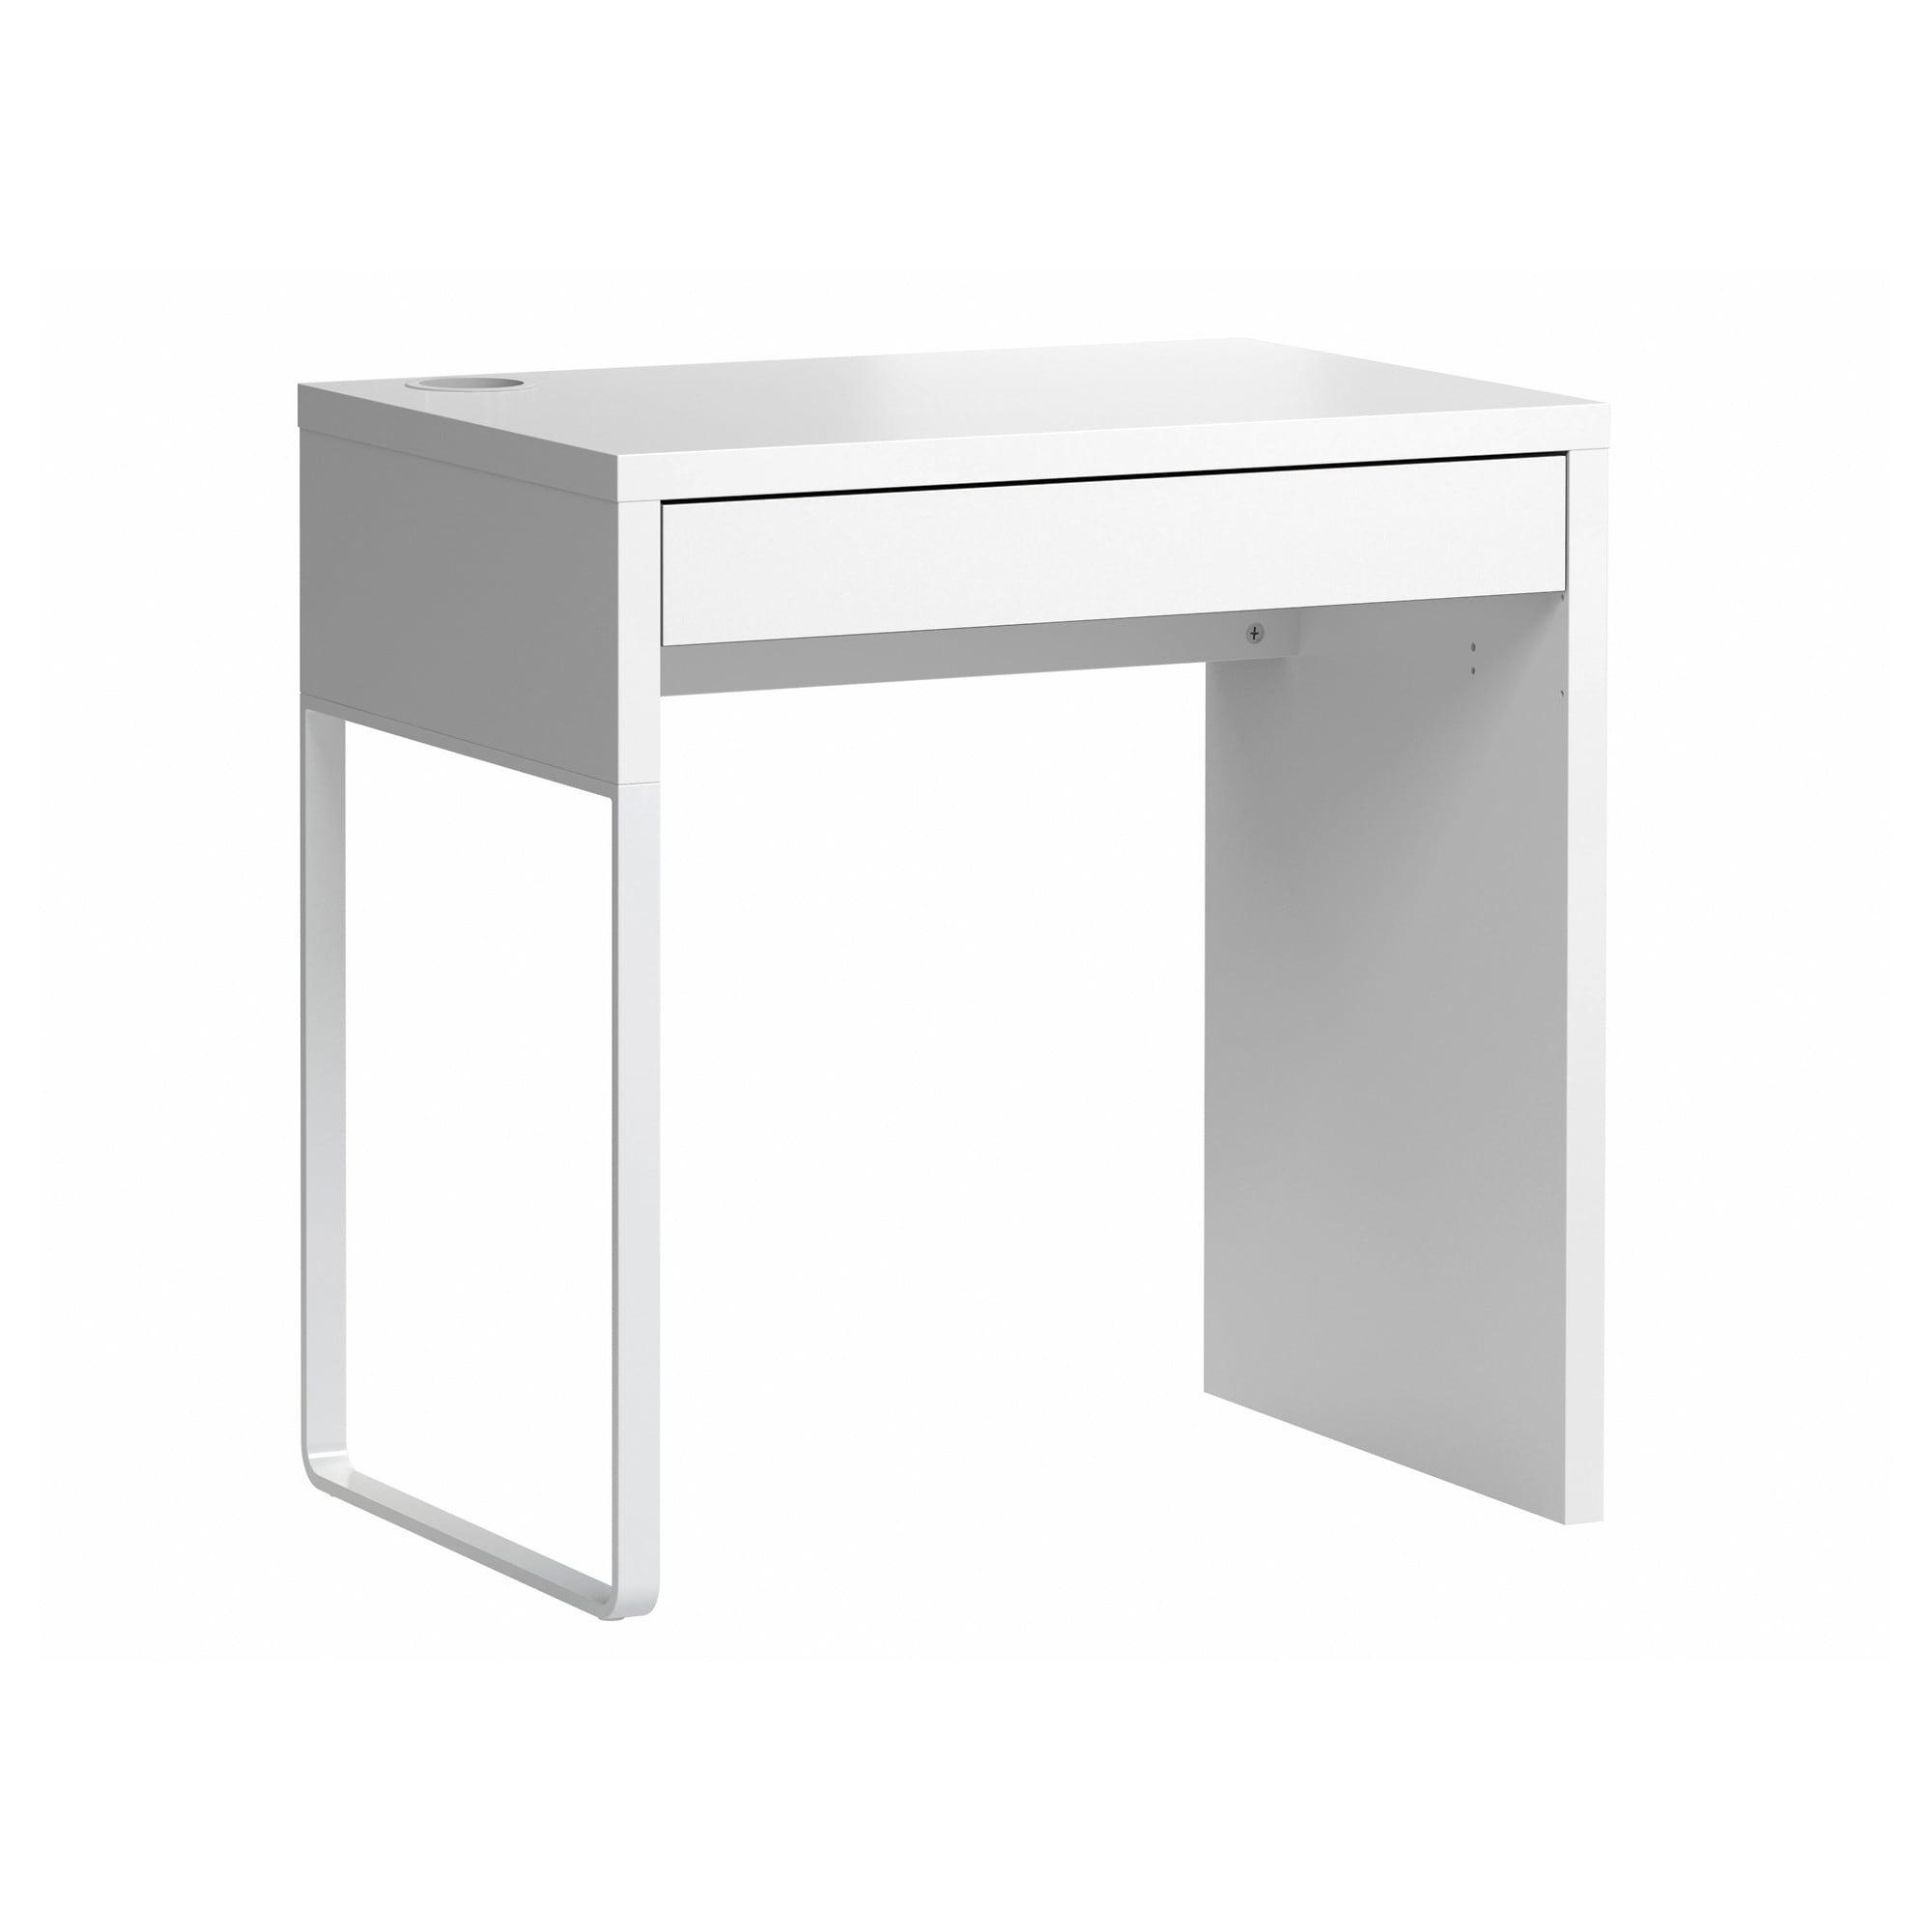 Ikea Mesas De Escritorio U3dh Escritorios Para ordenador Pra Online Ikea